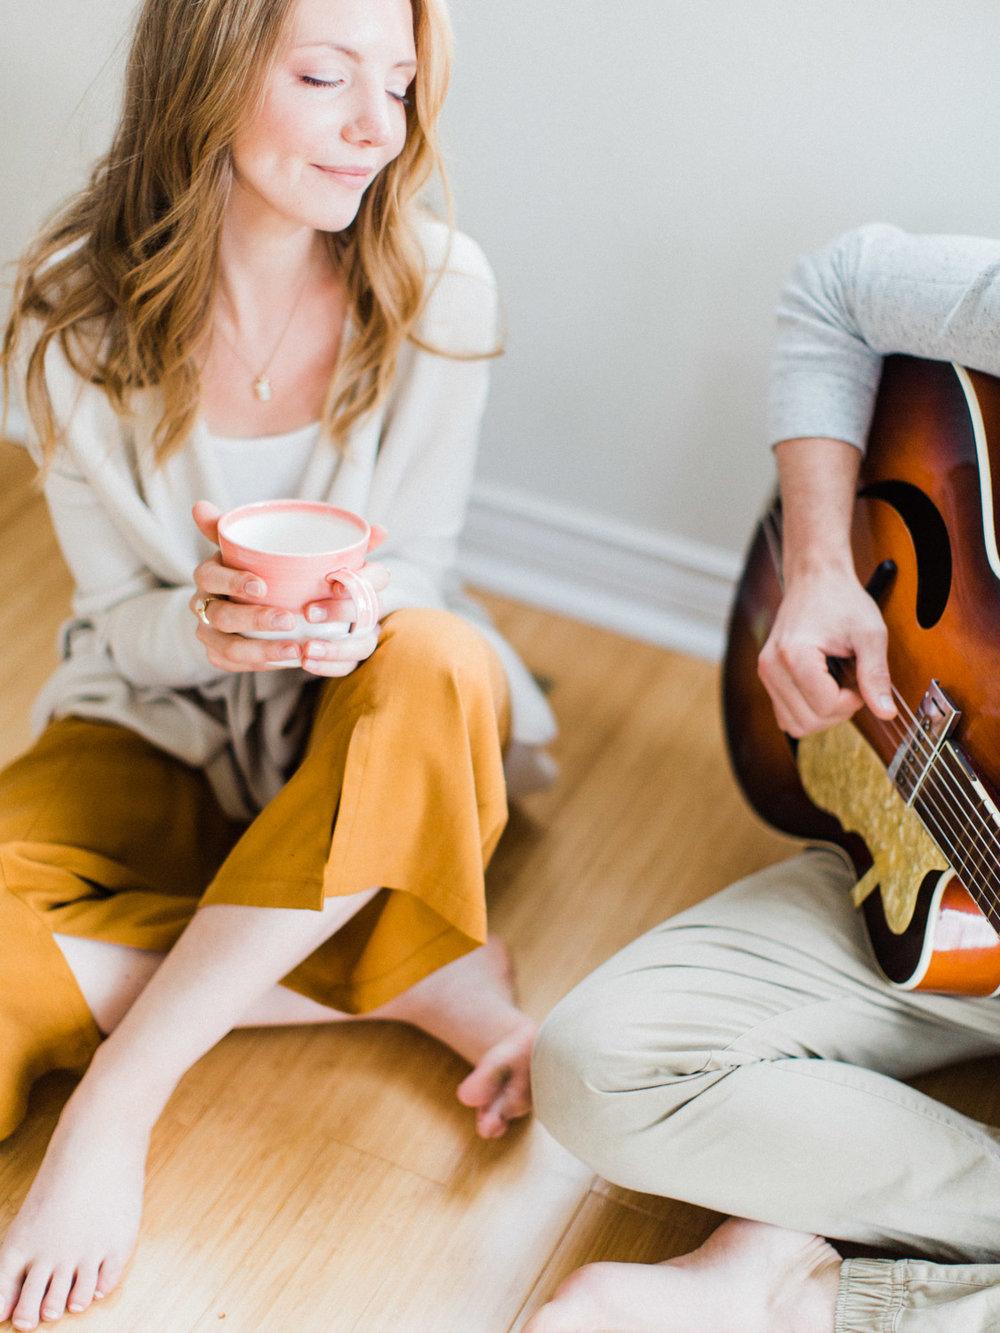 toronto-collingwood-wedding-photographer-at-home-engagement-inspiration 2018-171.jpg